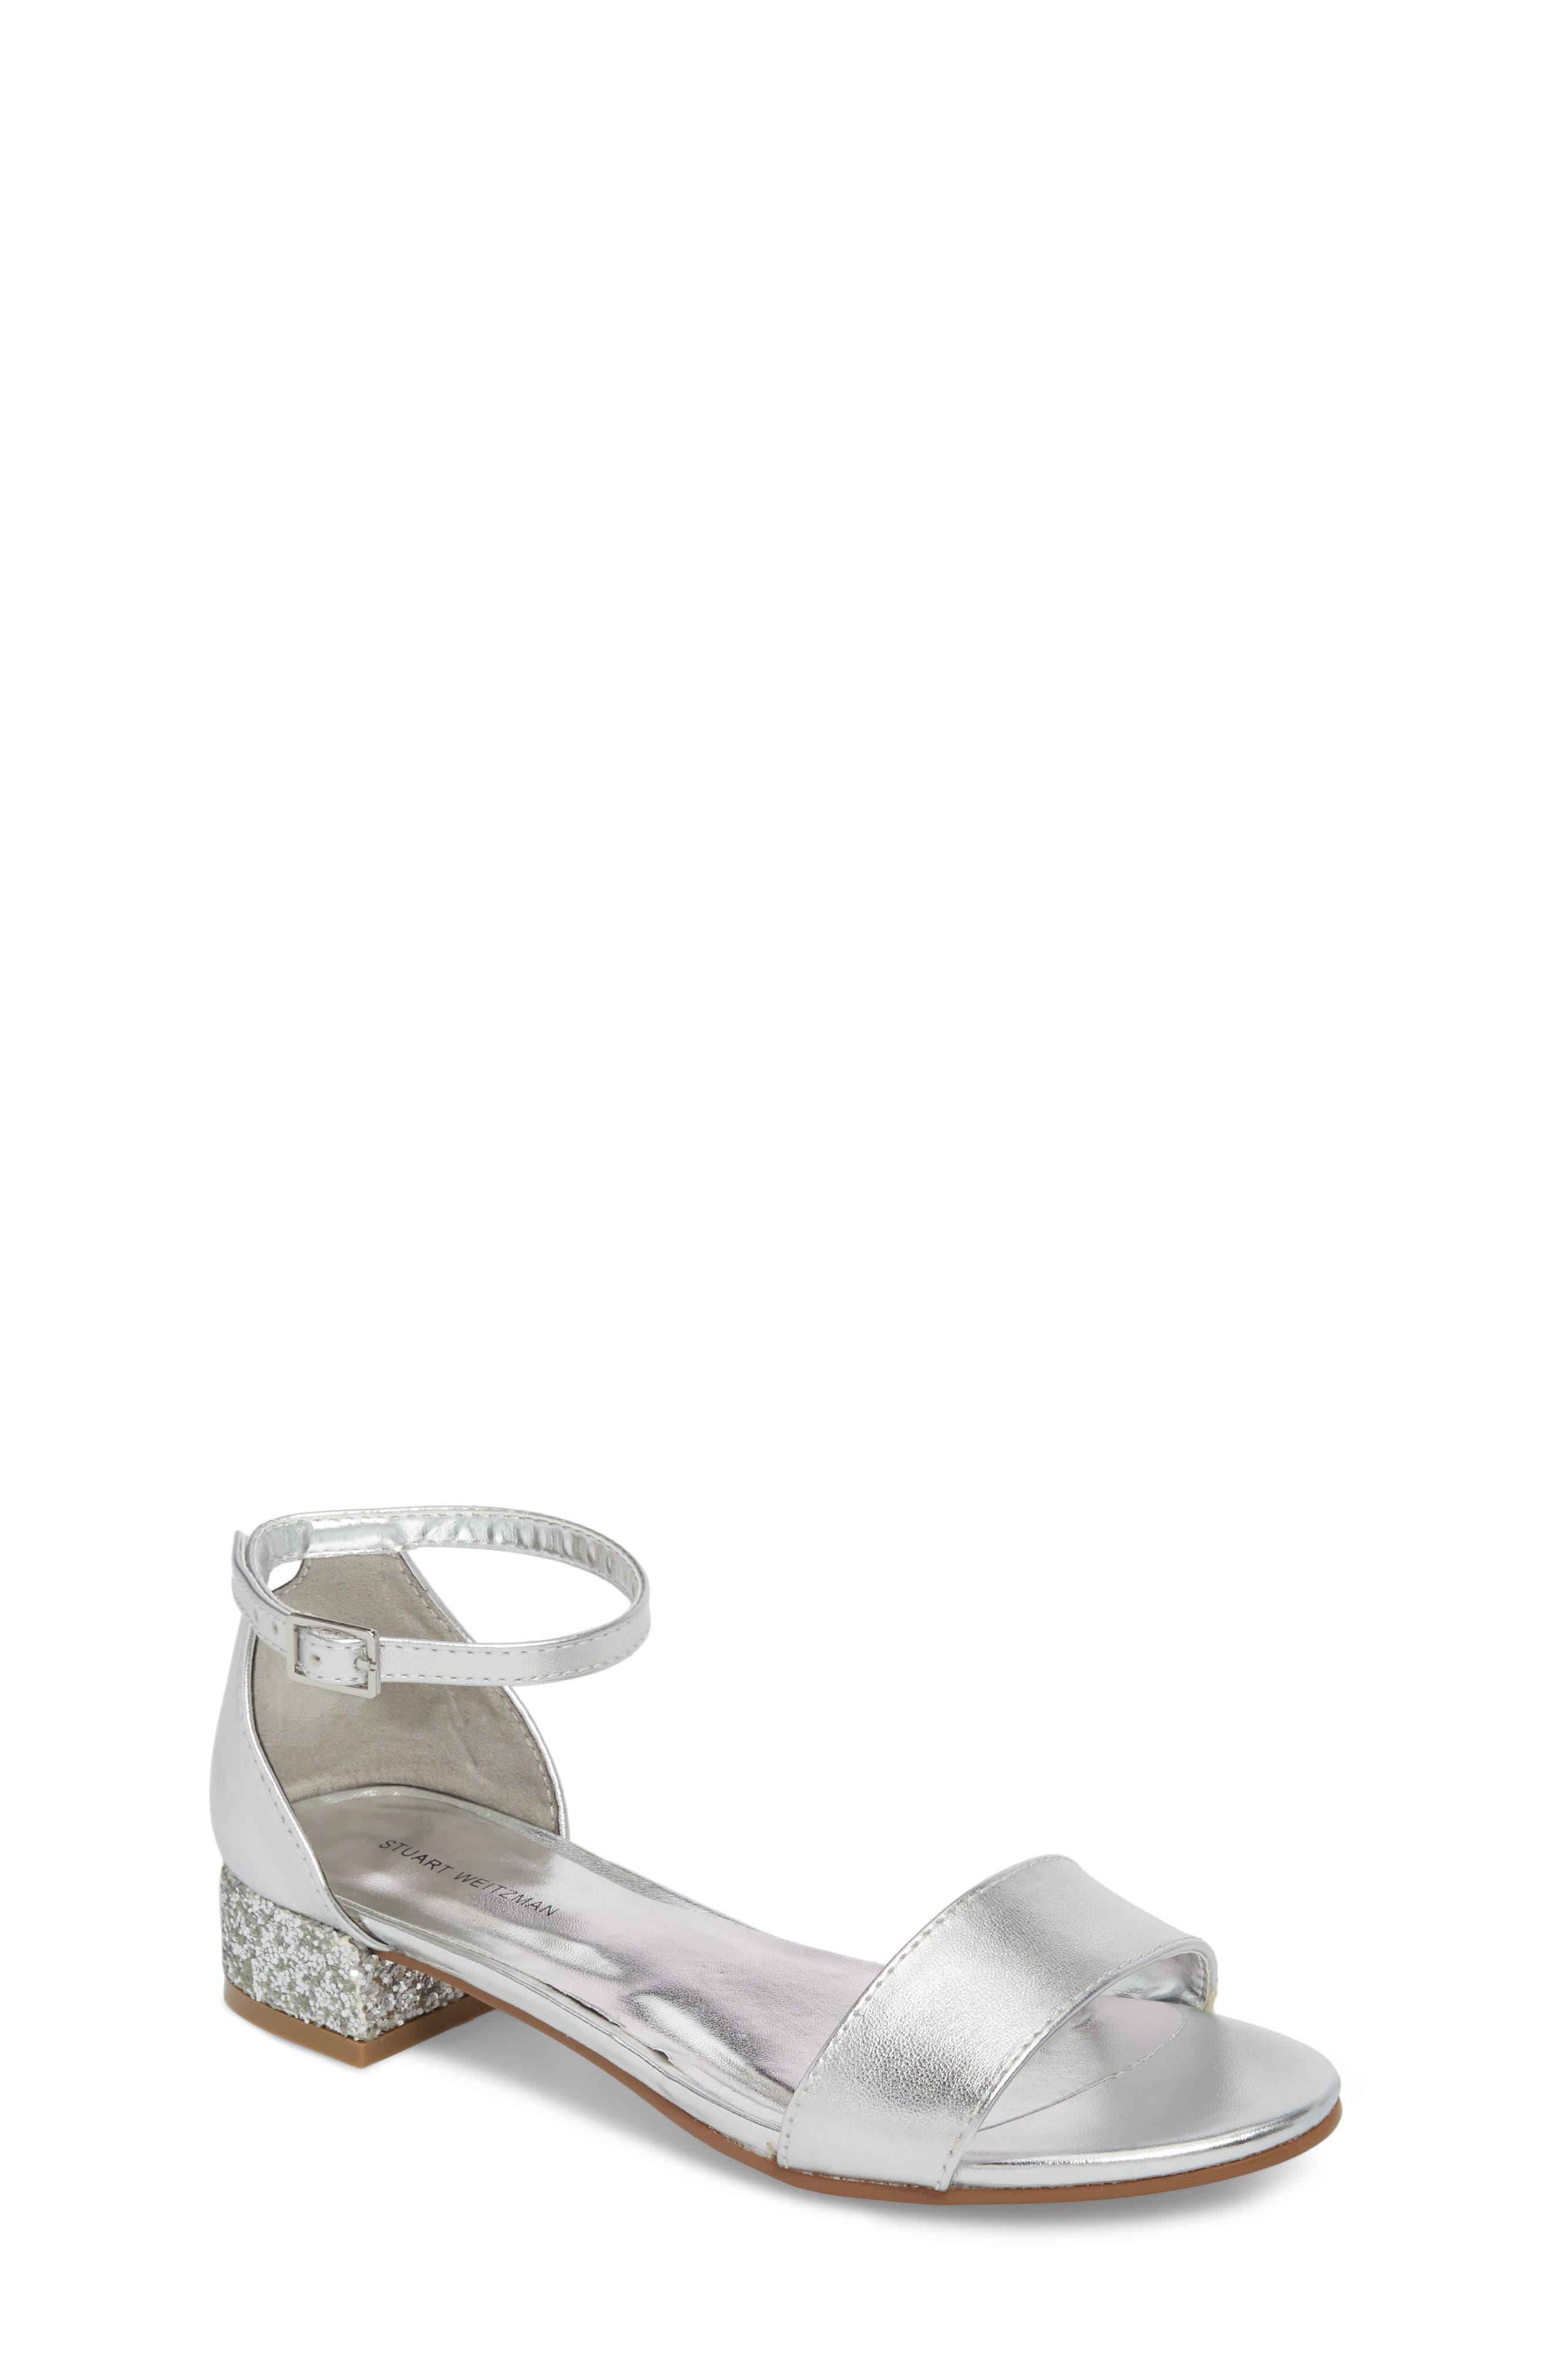 STUART WEITZMAN Penelope Glitter Heel Sandal, Main, color, SILVER